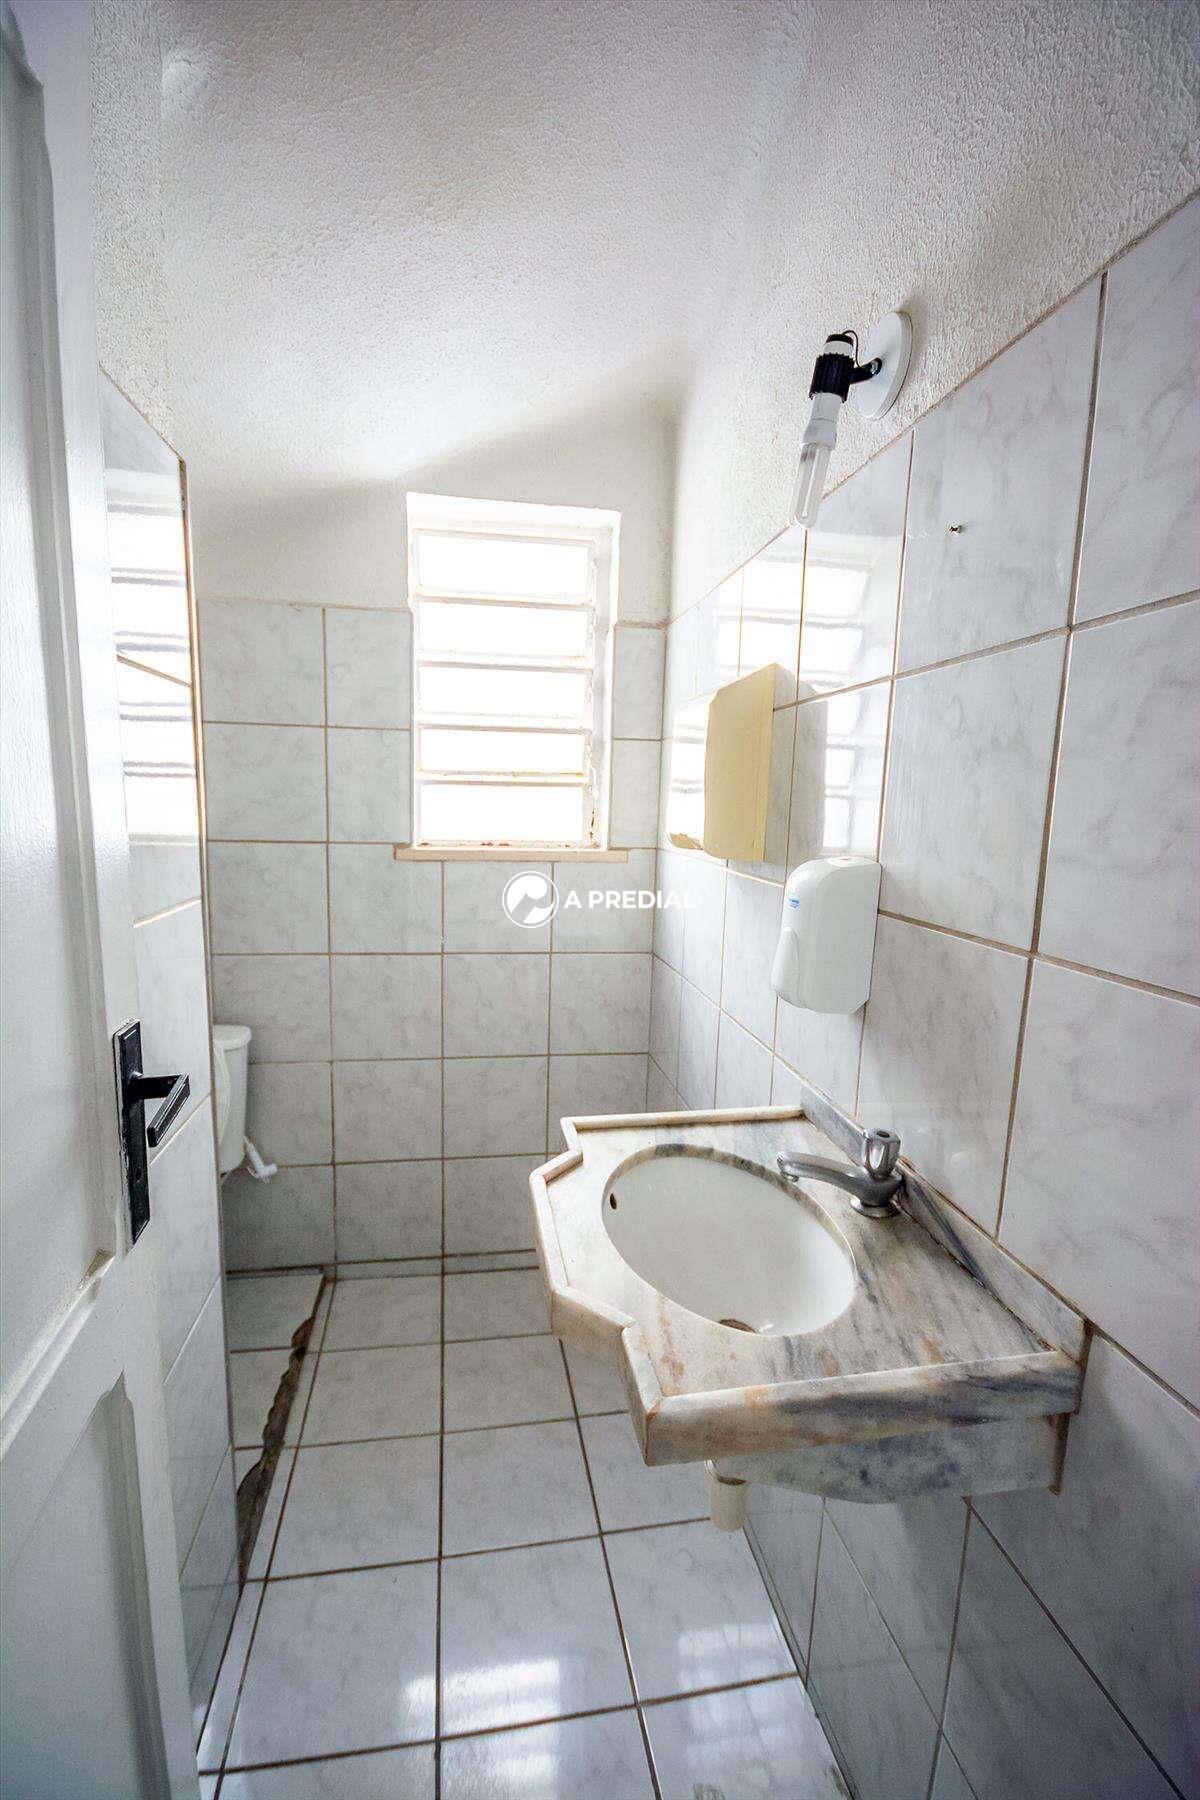 Casa para aluguel no Aldeota: 7d591040-4-dsc_0159.jpg